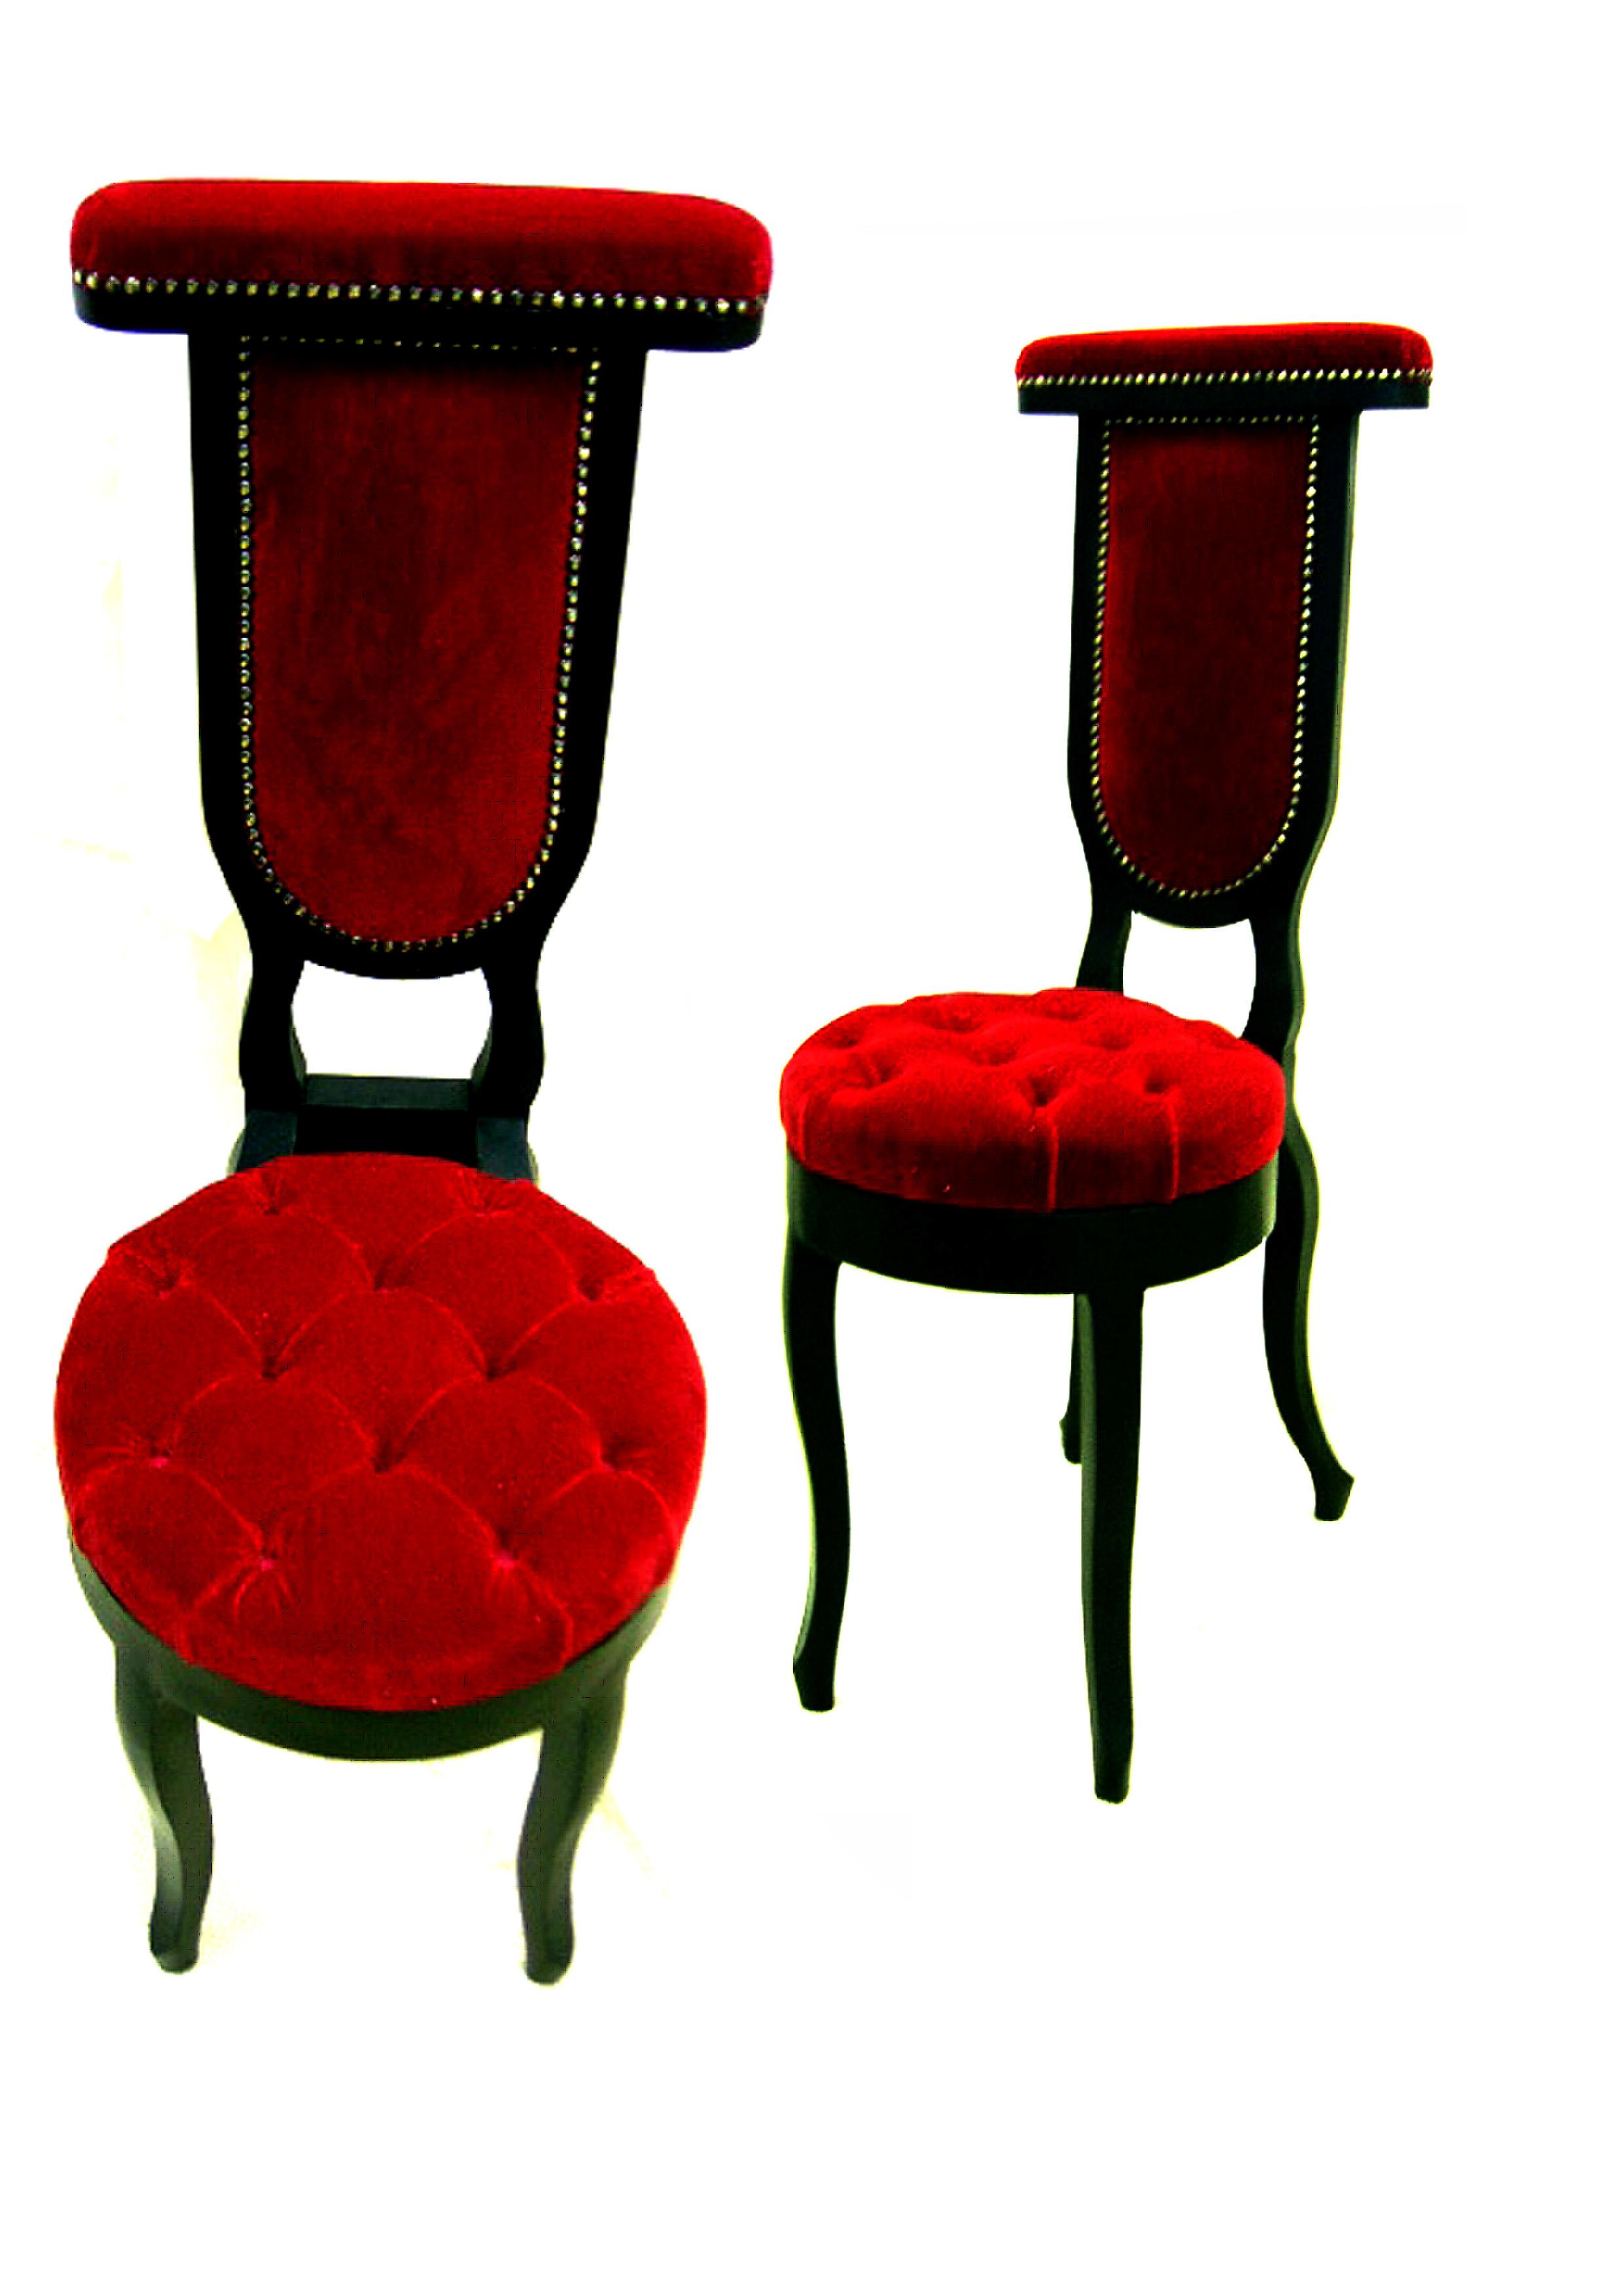 Cr ation restauration anciens meubles fauteuils chaises for Club meuble avantage